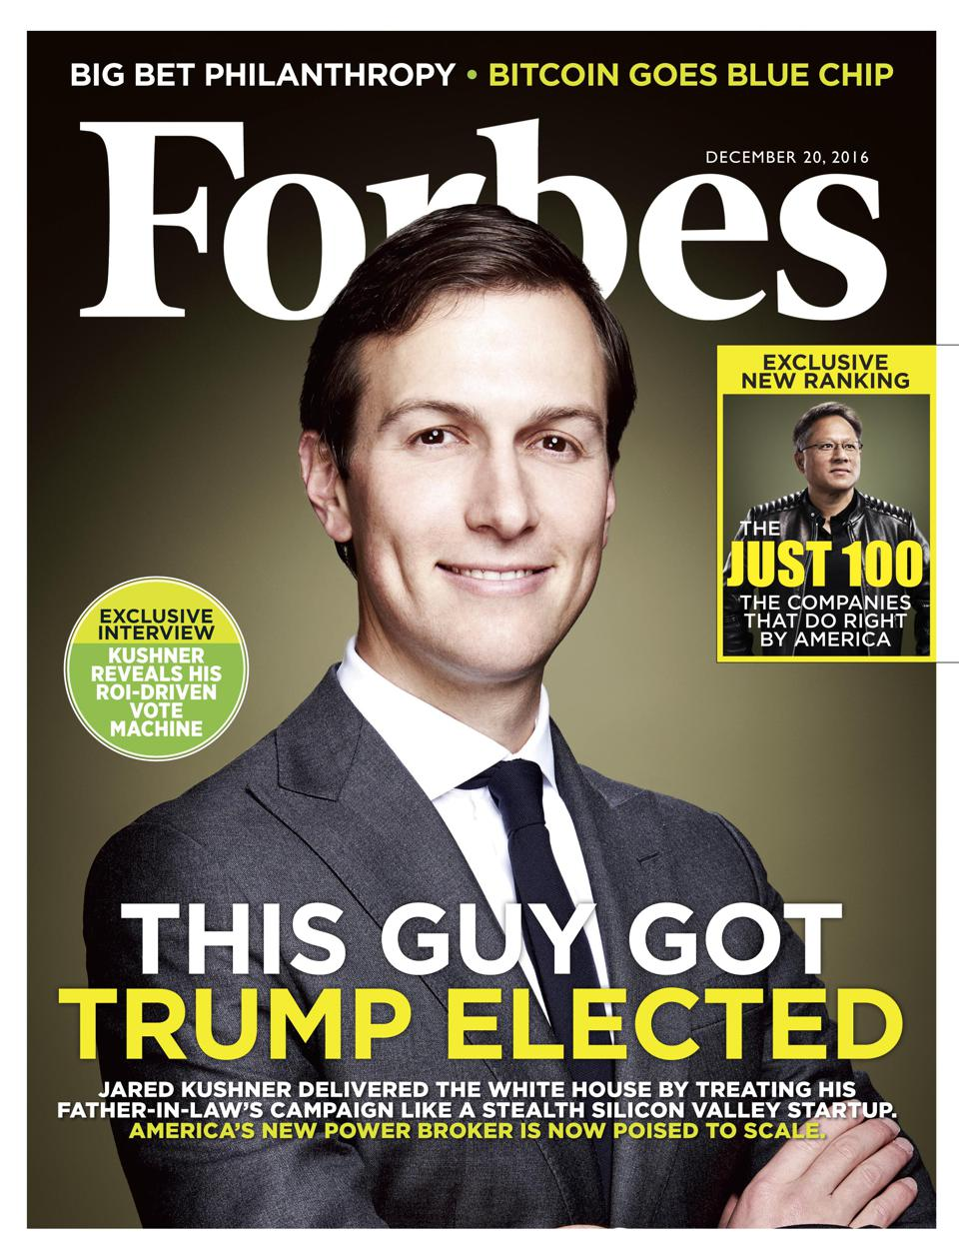 Jared Kushner: The FORBES cover story